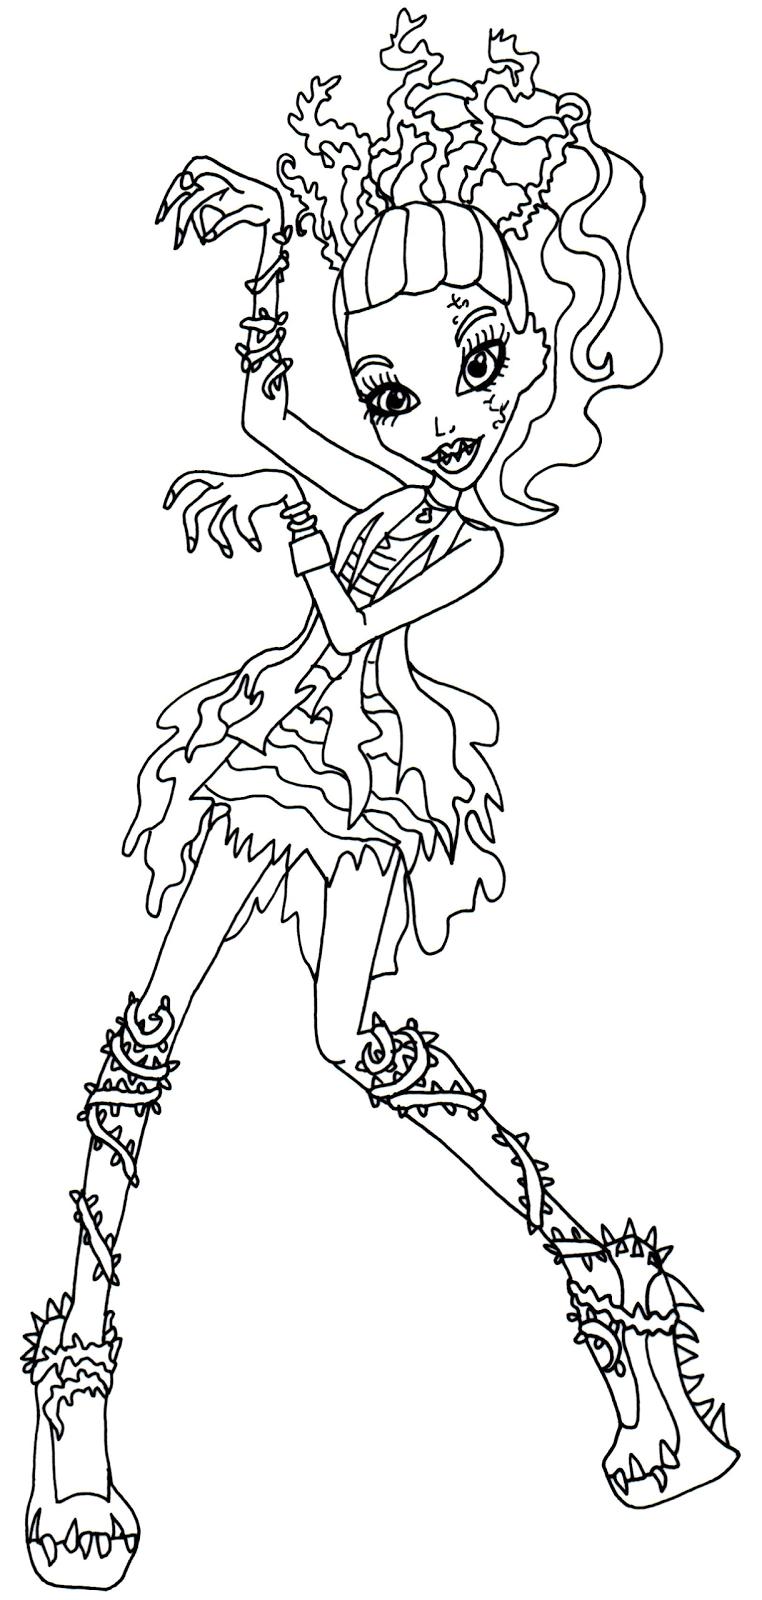 venus mcflytrap zombie shake dance monster high coloring page - Coloring Pages Monster High Venus